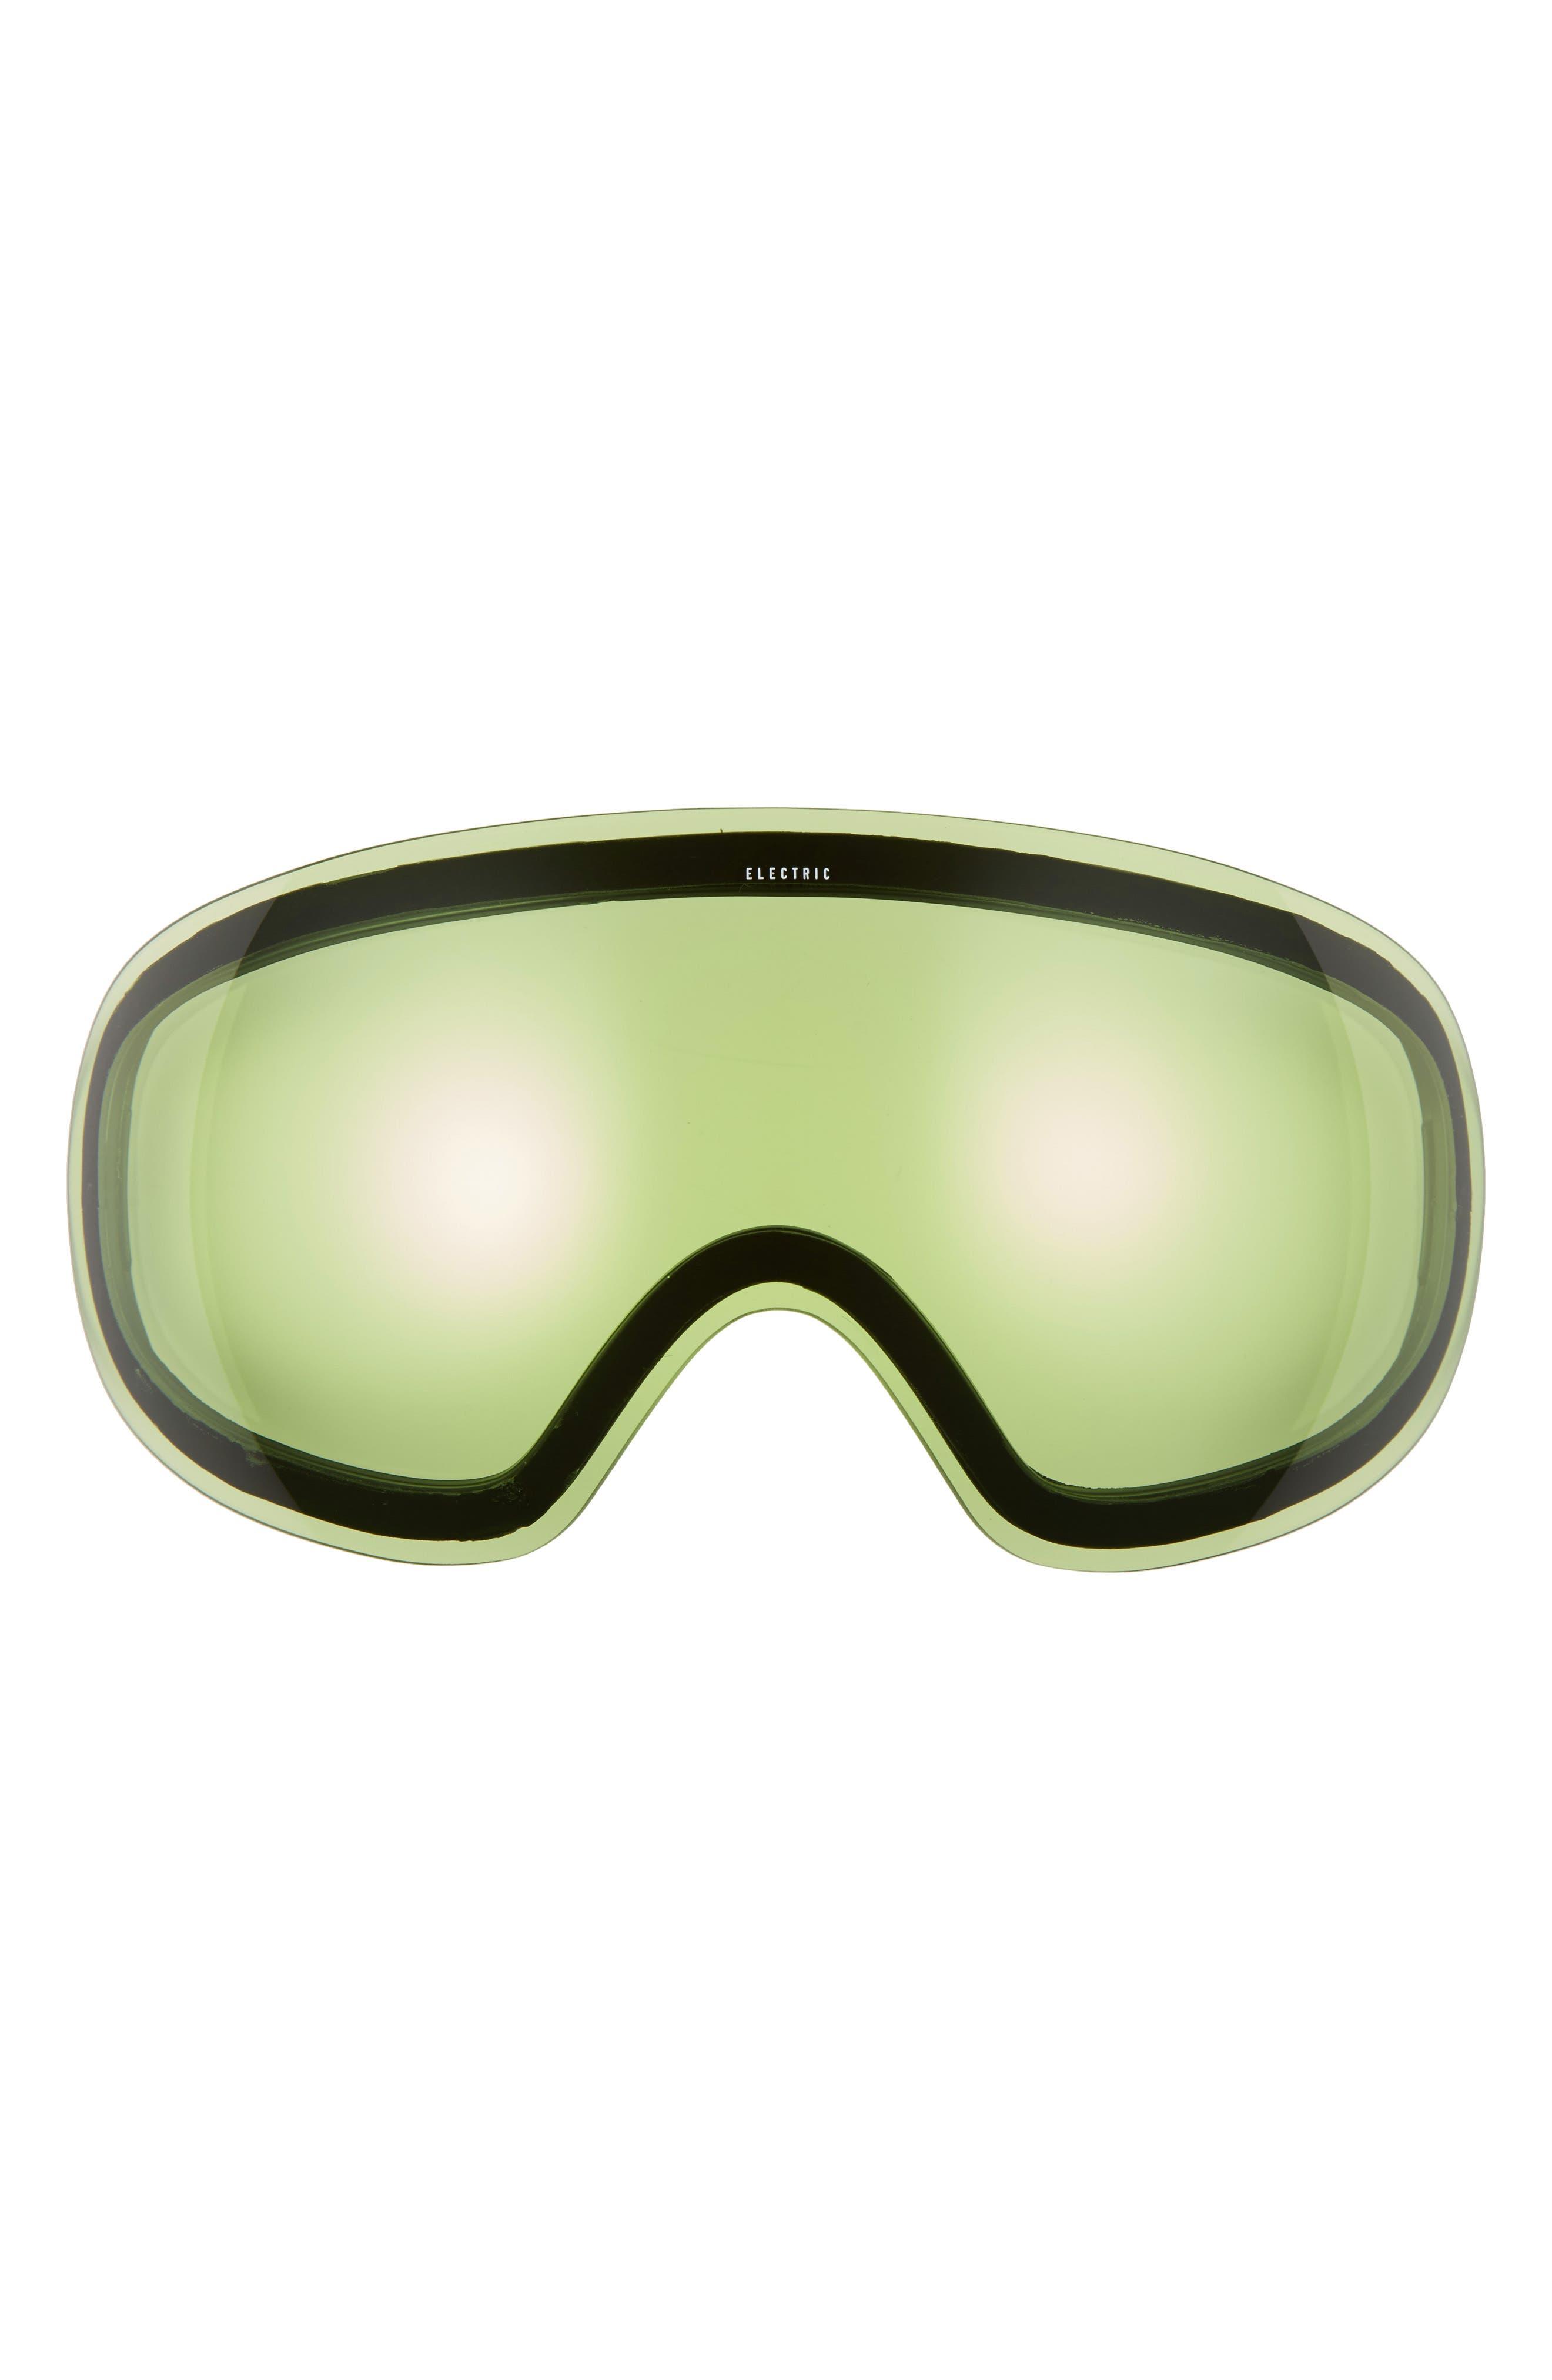 EG3 254mm Snow Goggles,                             Alternate thumbnail 30, color,